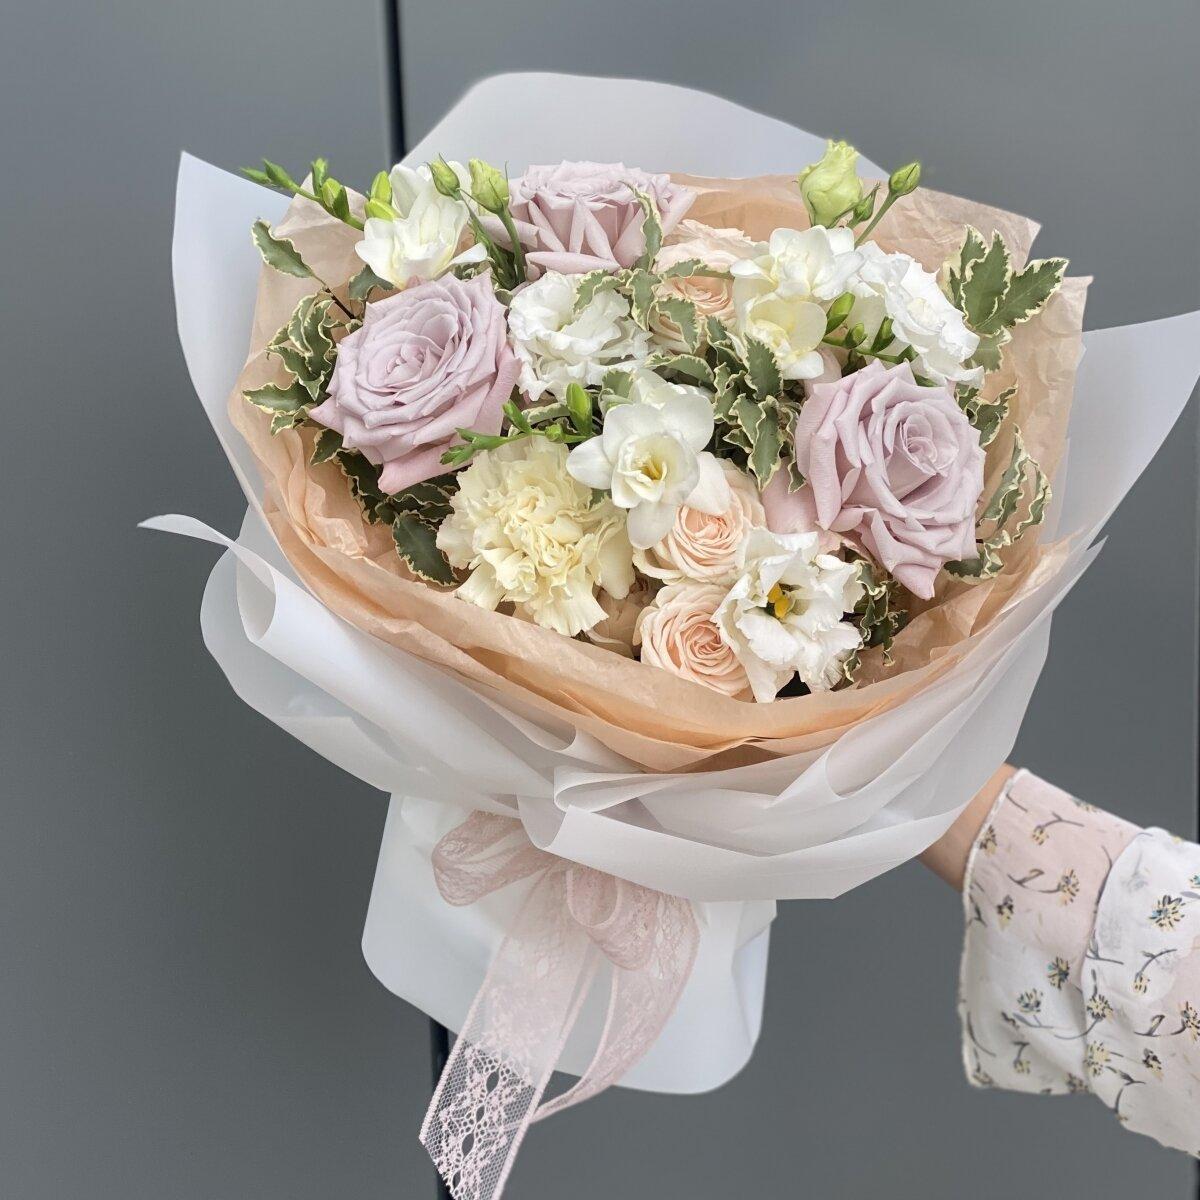 Букет Солетто из роз мента, фрезии, питтоспорума и роз